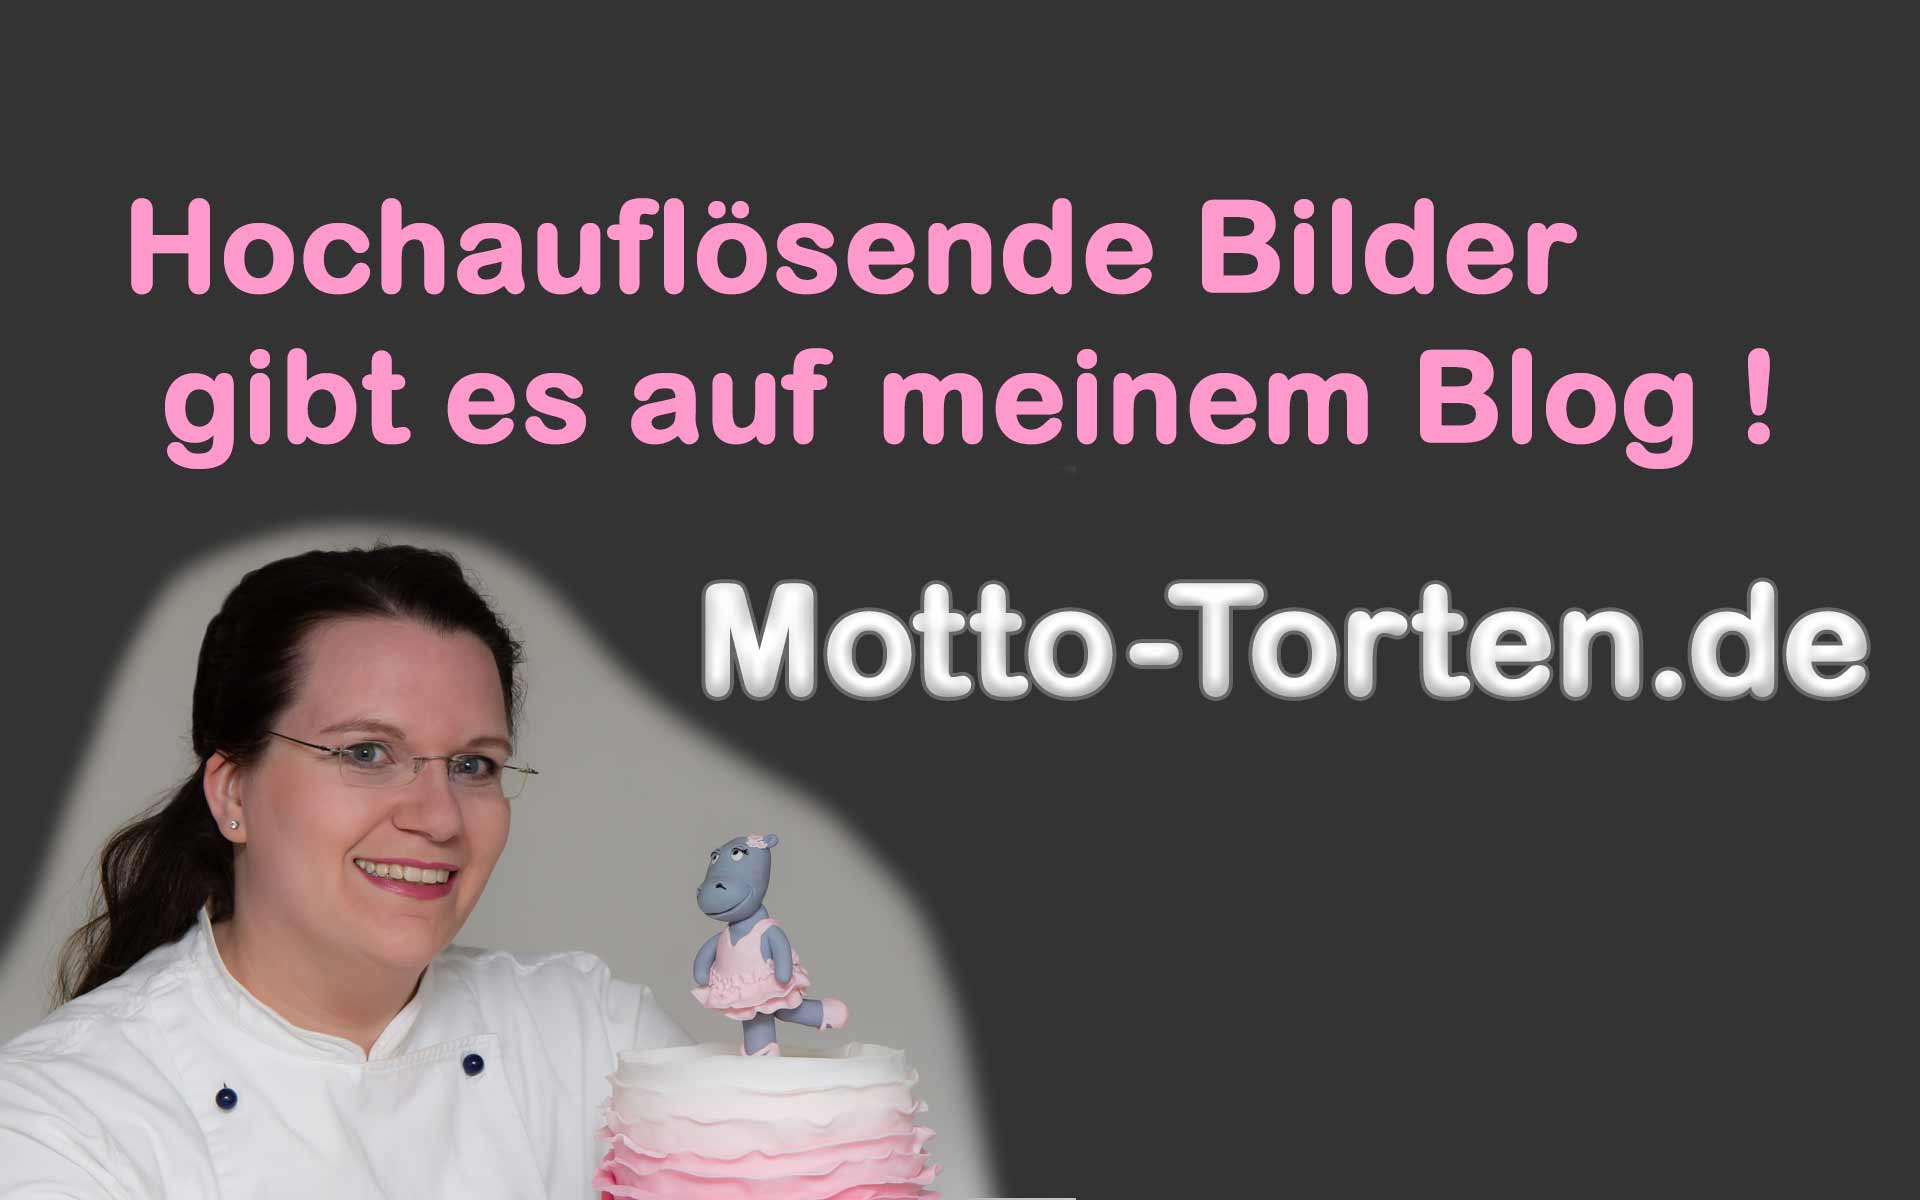 Begrüßung durch den Burda Verlag